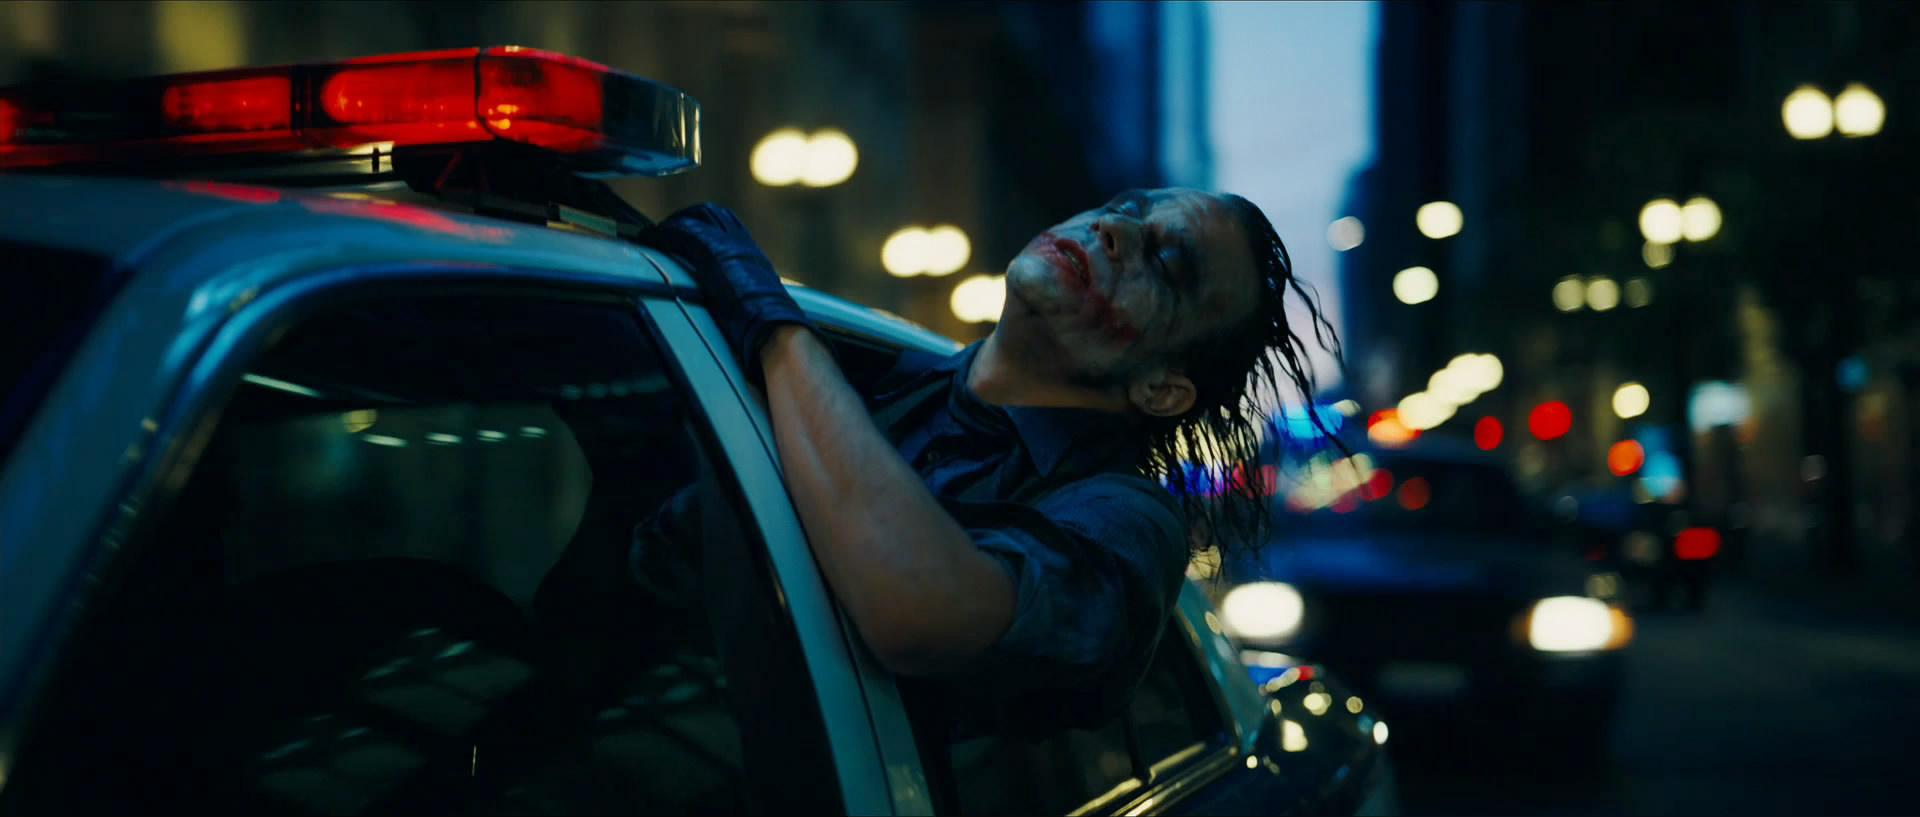 joker-cop-car-heath-ledger-snapshot20080